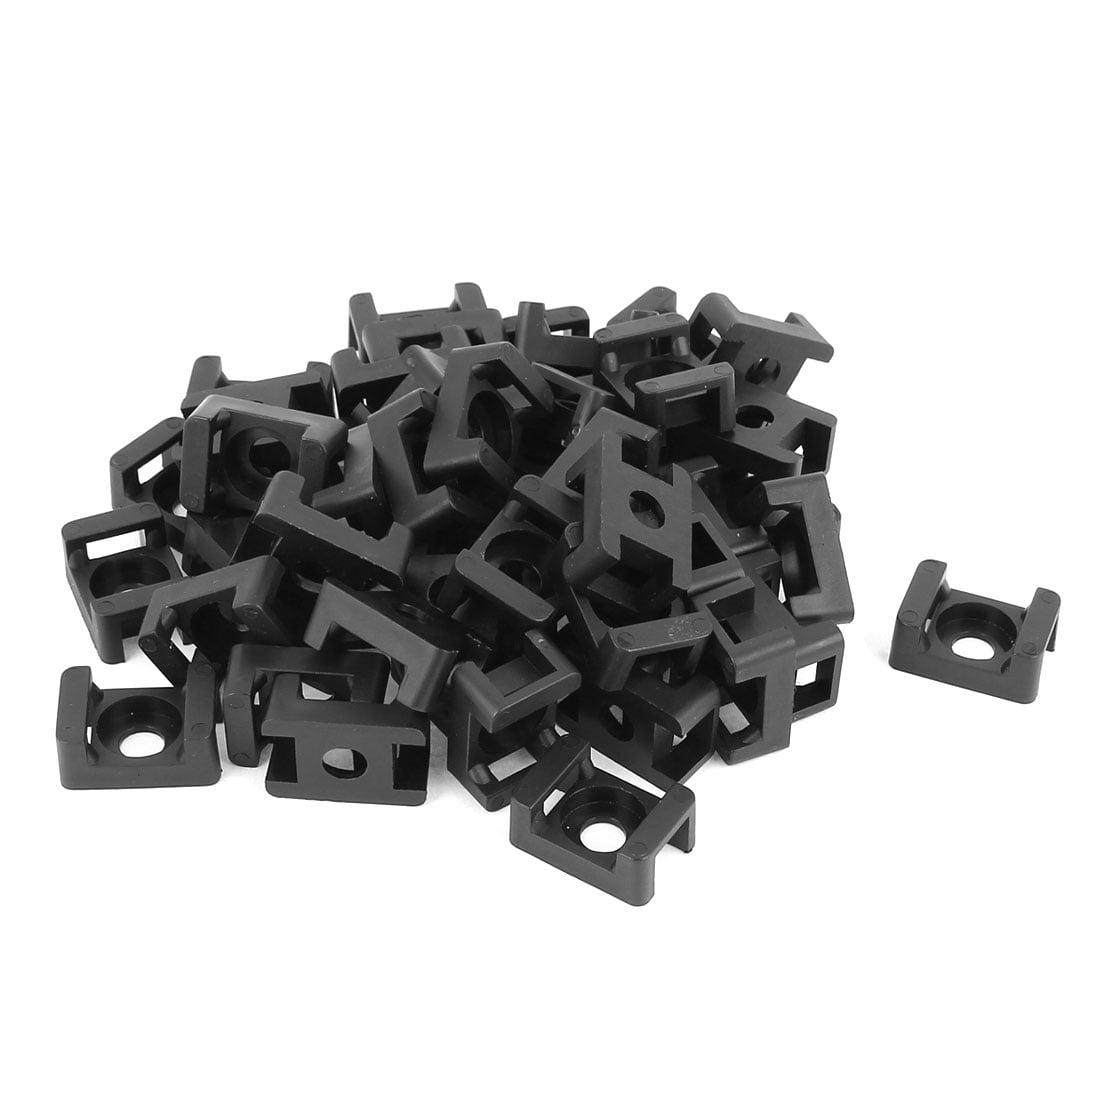 Plastic Saddle Type Cable Tie Base Mount Wire Holder Black 23 x 16 x 10mm 35 PCS